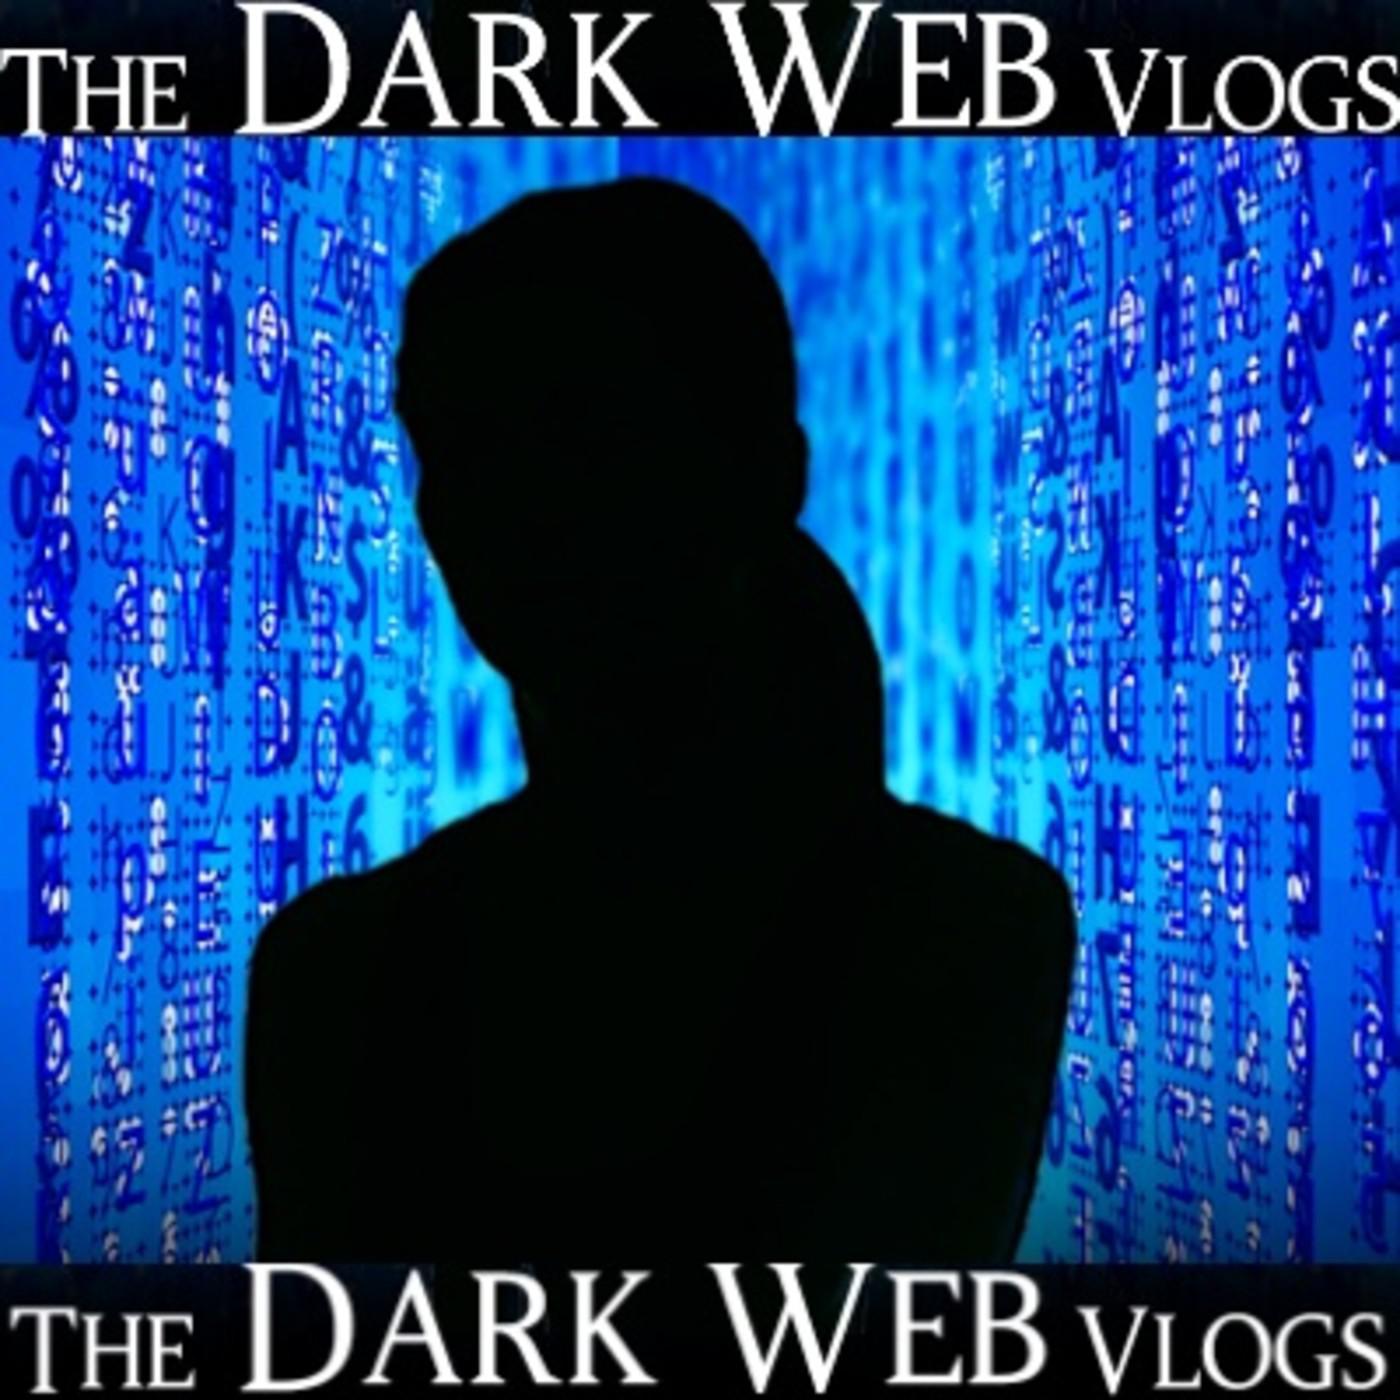 The Dark Web Vlogs (podcast) - The Dark Web Vlogs | Listen Notes